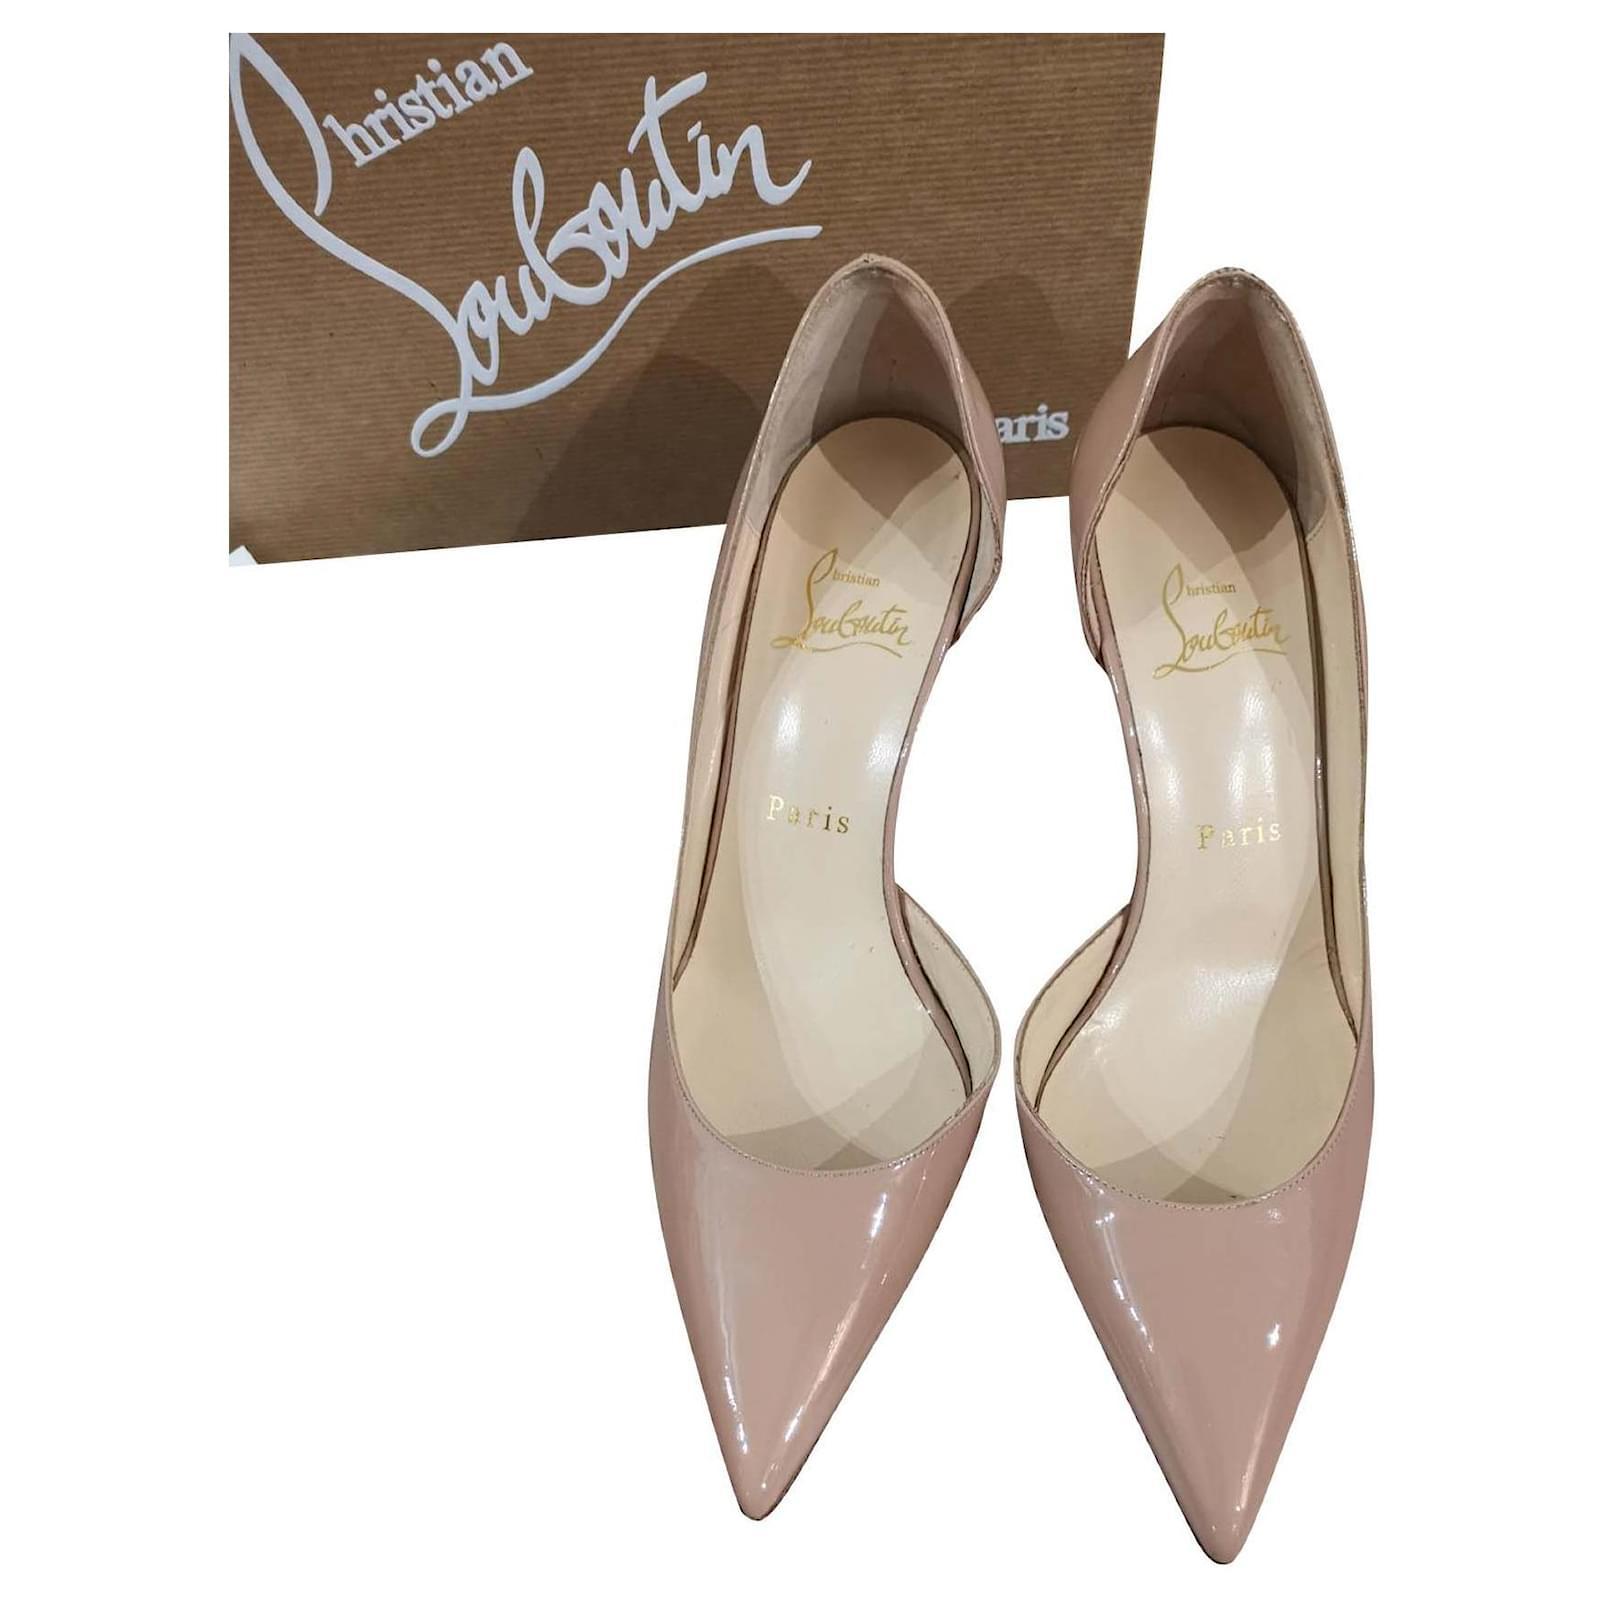 plus récent c9b3e 941ec Christian Louboutin Nude Iriza heels EU36.5